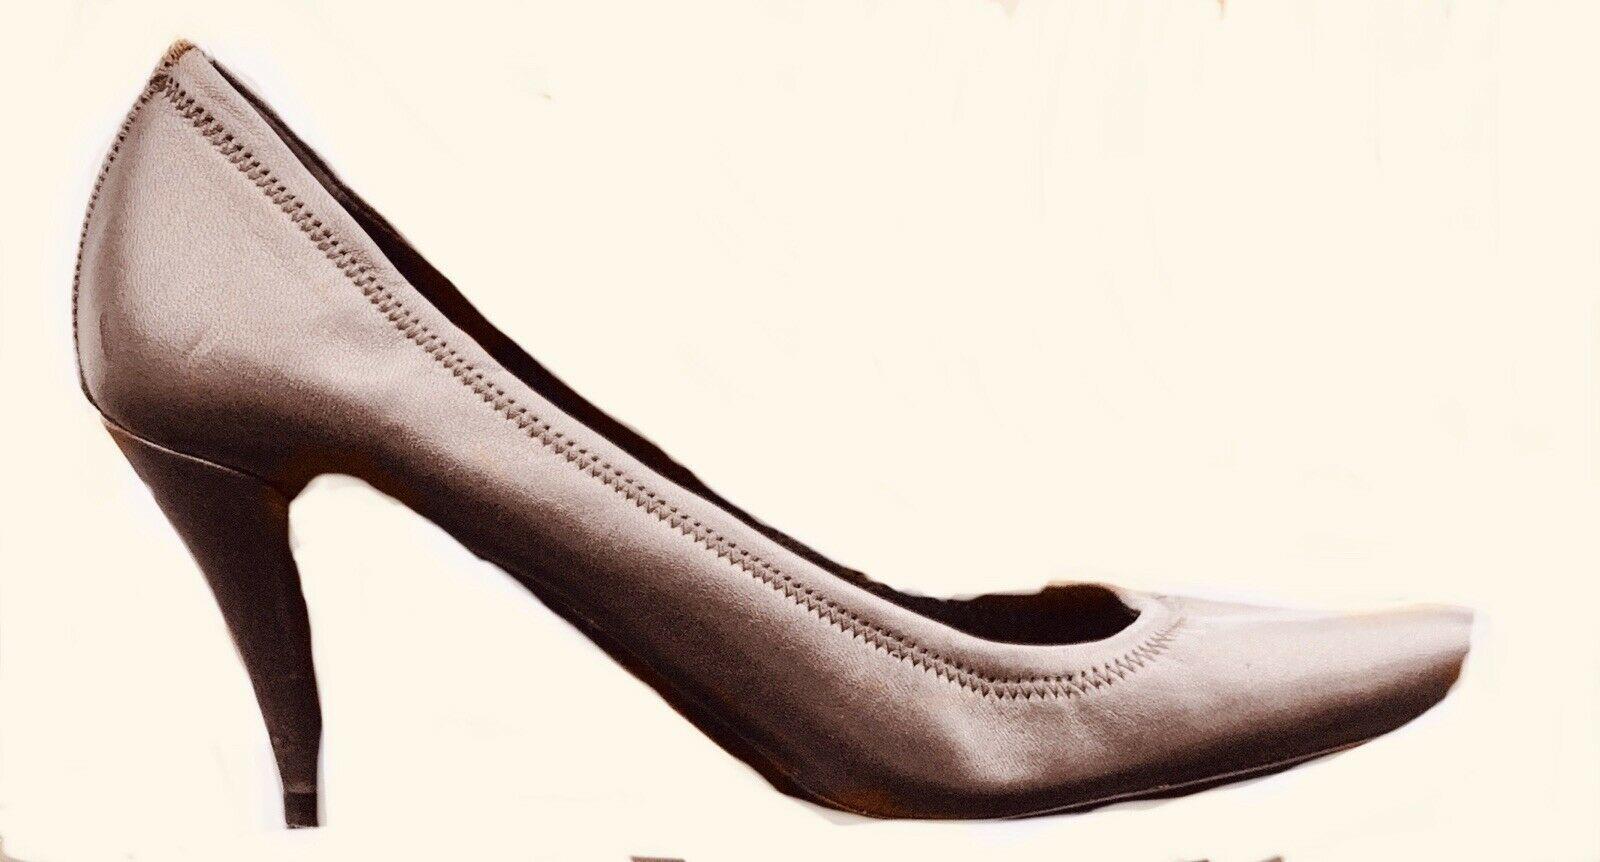 Women's PRADA Dark Grey Calf Leather Thin Heel Pump Shoes Size 391/2